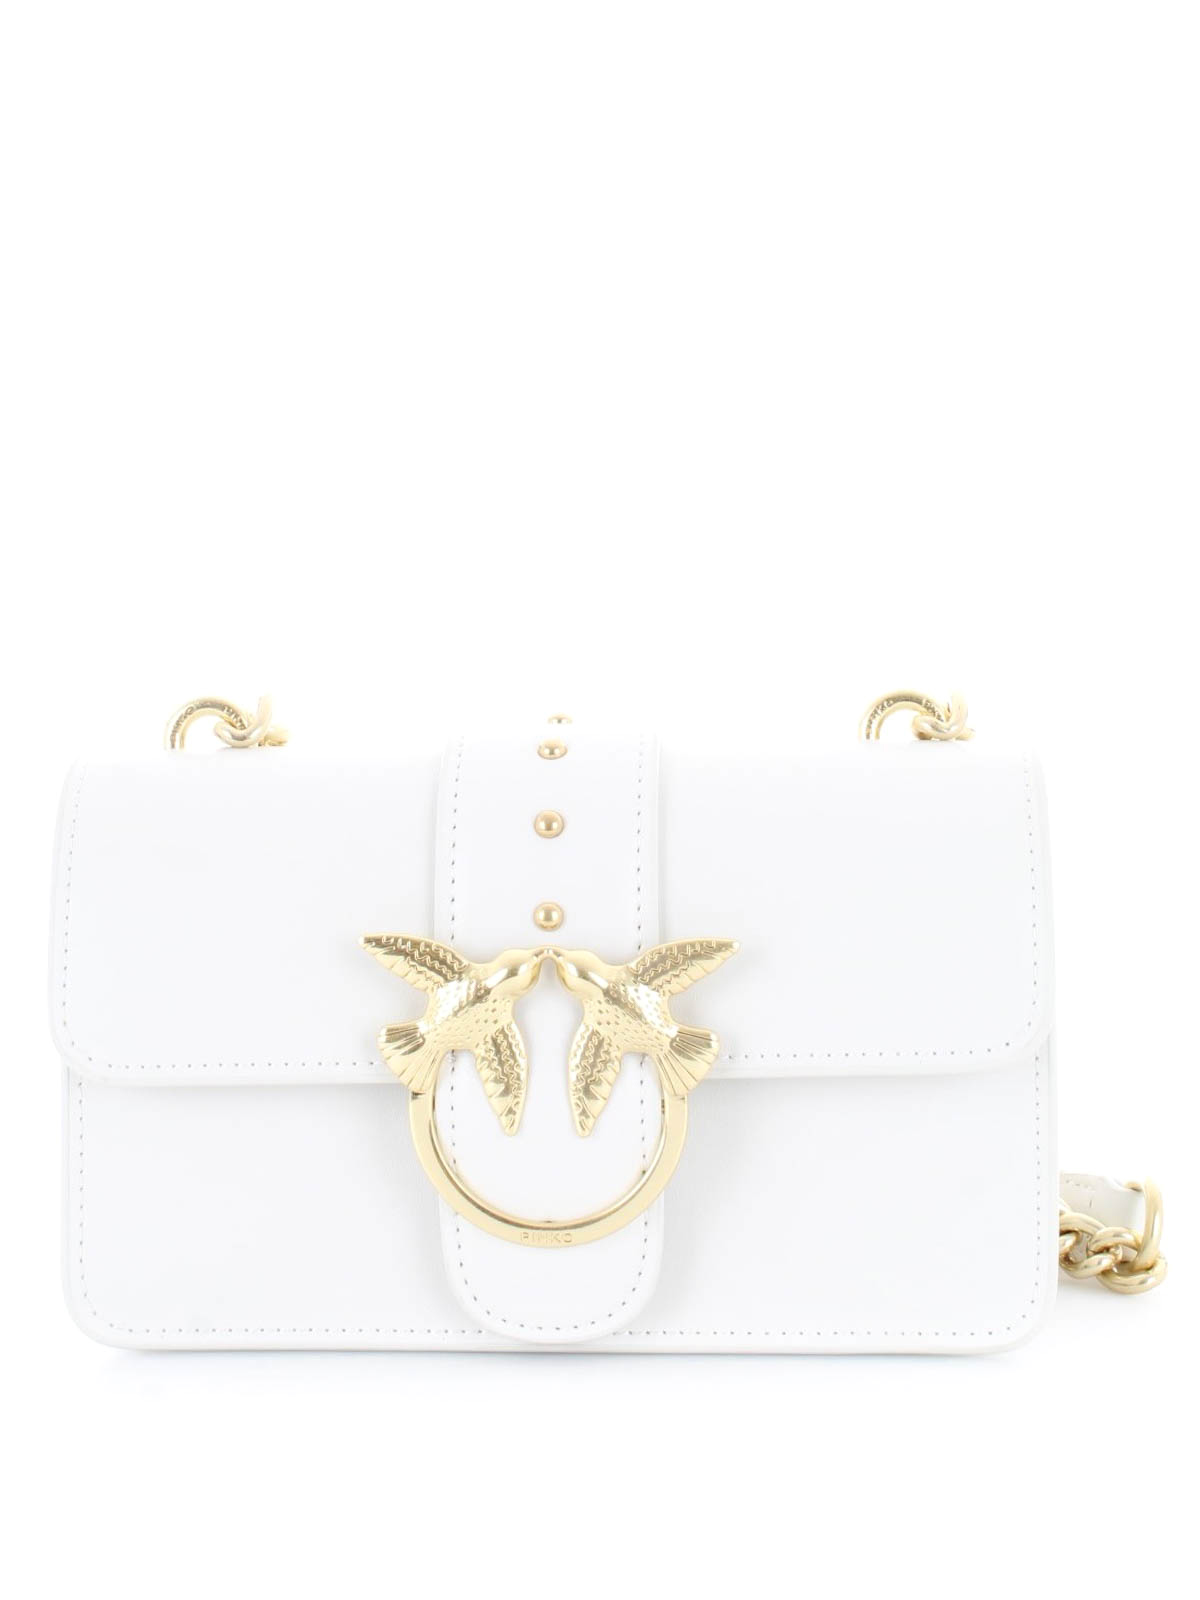 c94588f7165 Pinko - Mini Love Bag Simply white crossbody - cross body bags ...